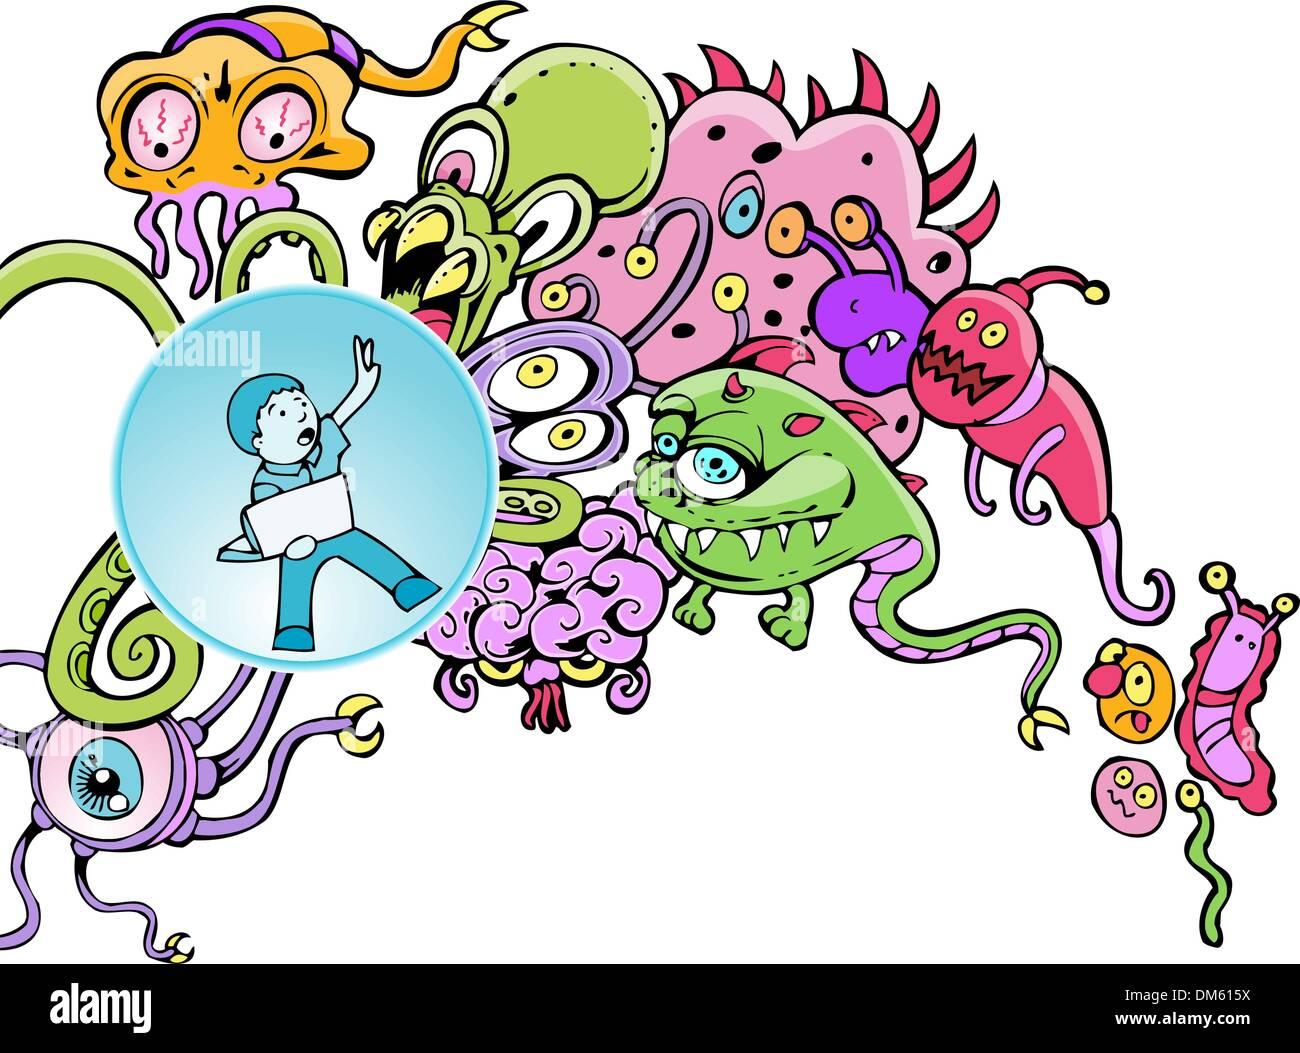 Virus That Attacks Bacteria Stock Photos